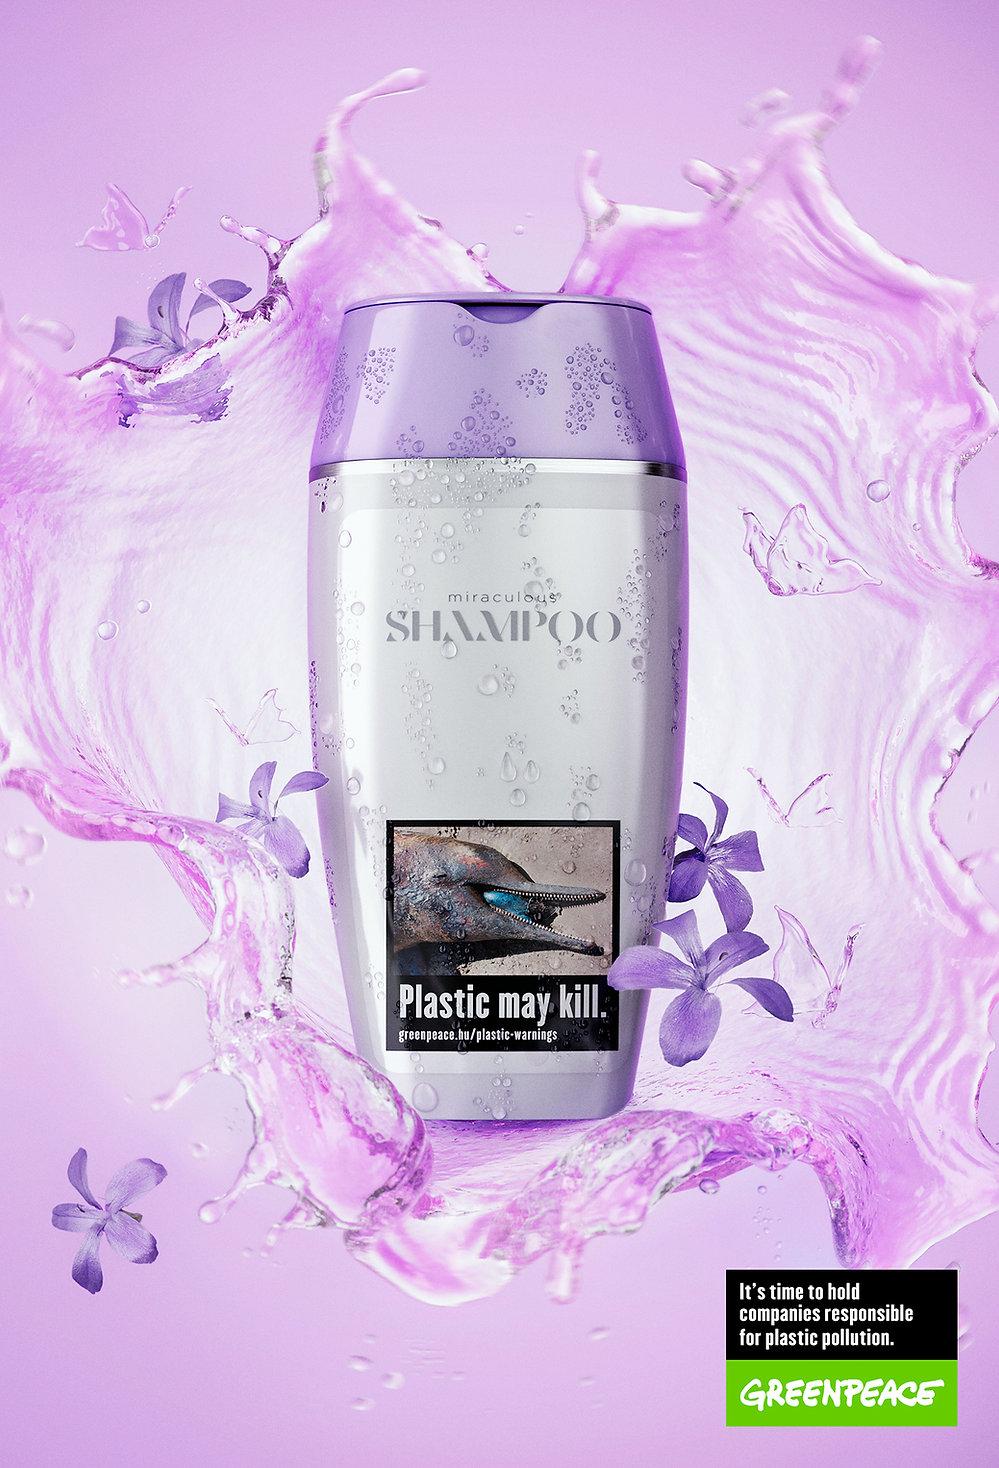 GP_activist_kit_poster_02_shampoo_RGB_lo